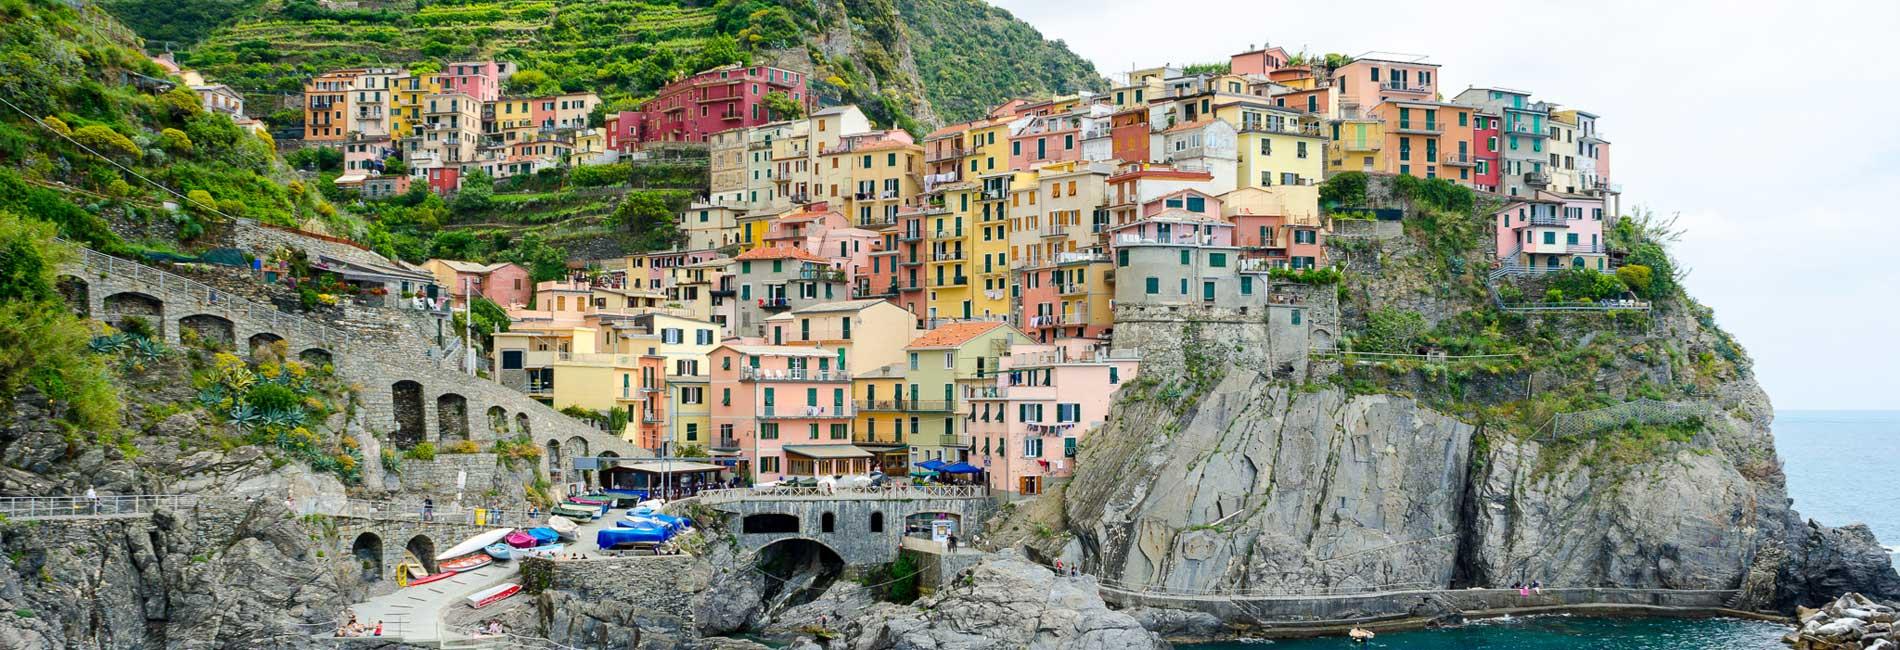 Foto di Manarola, Cinque Terre Liguria